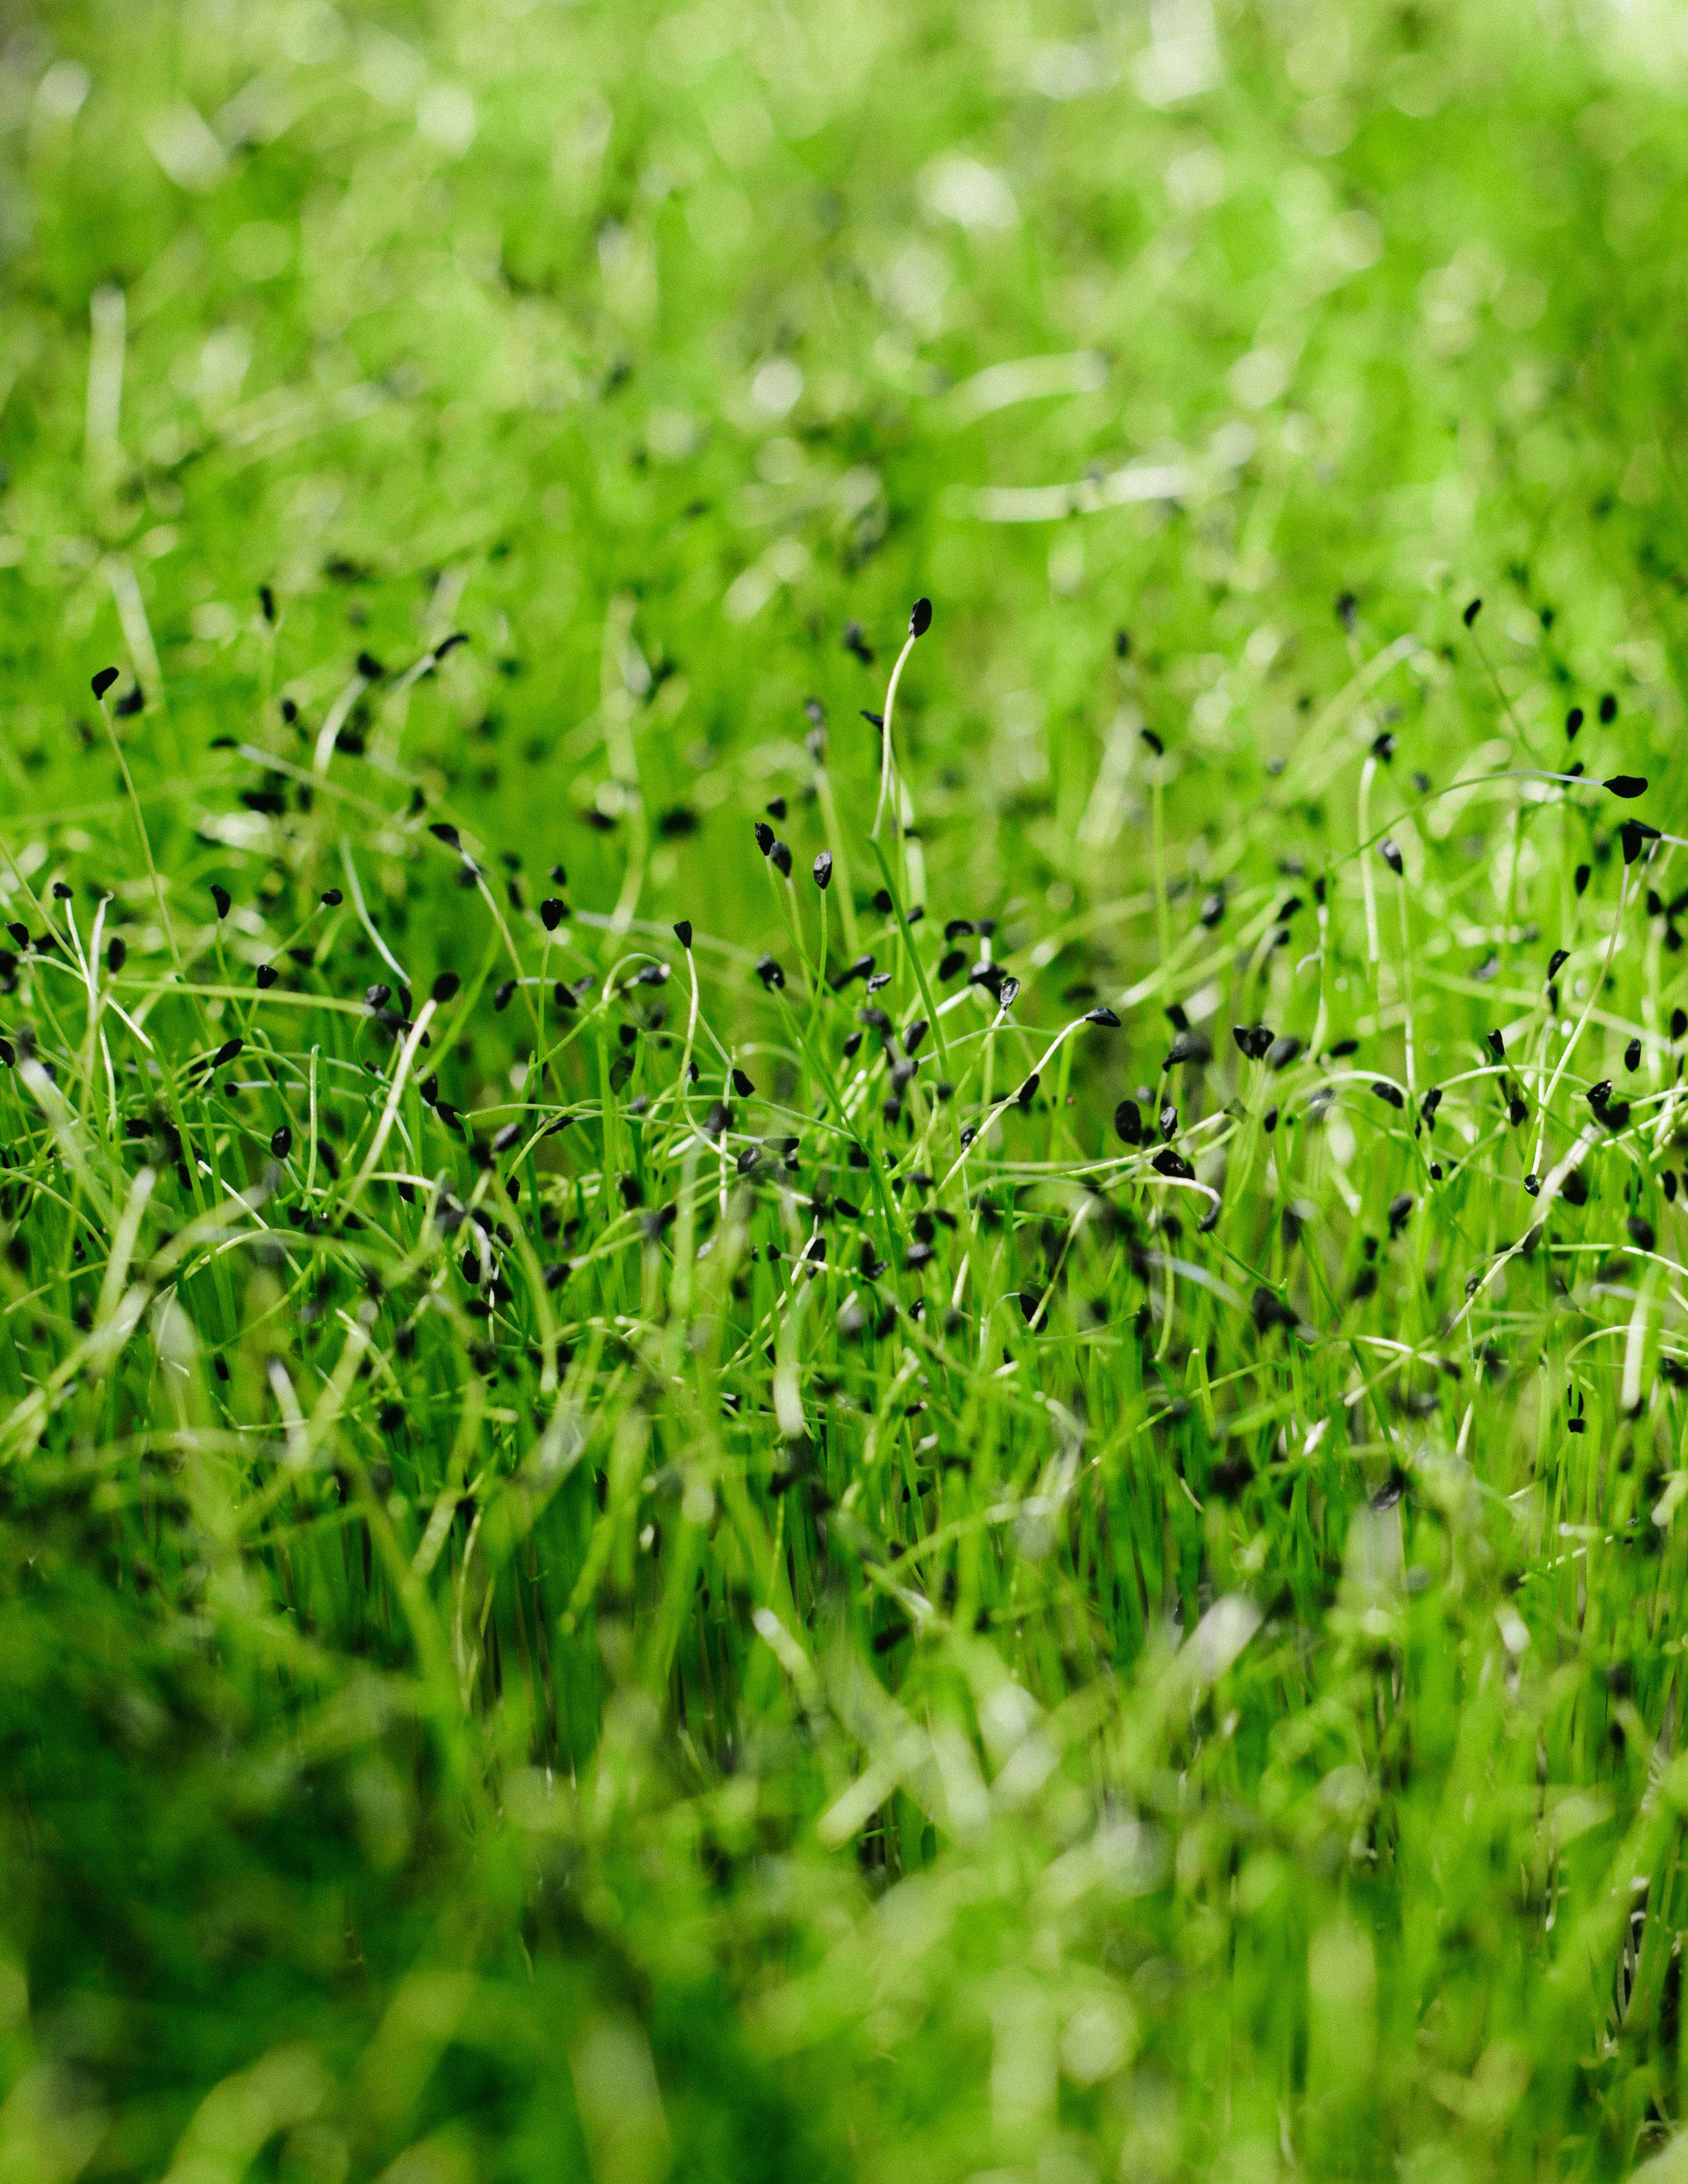 Microgreens photographed by Adam DeTour